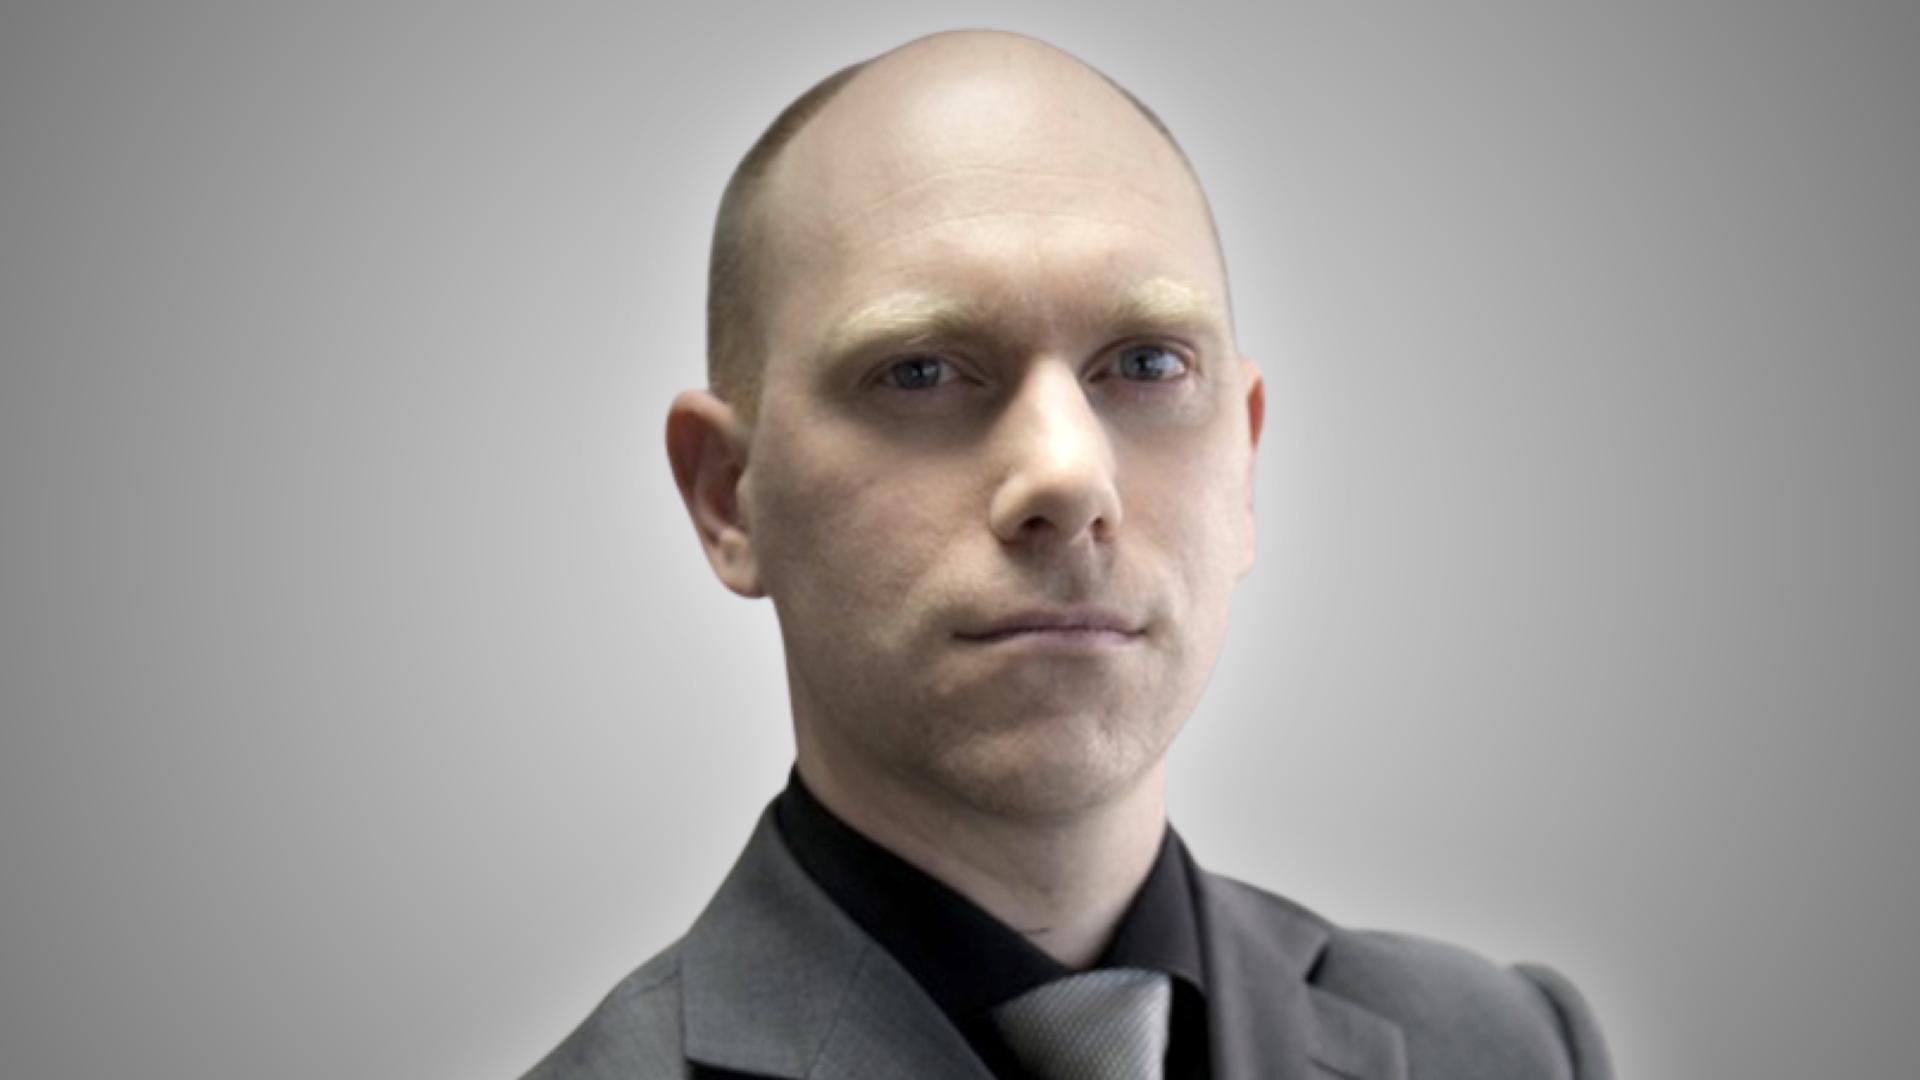 Benoit Grunemwald Expert en Cyber sécurité, ESET France